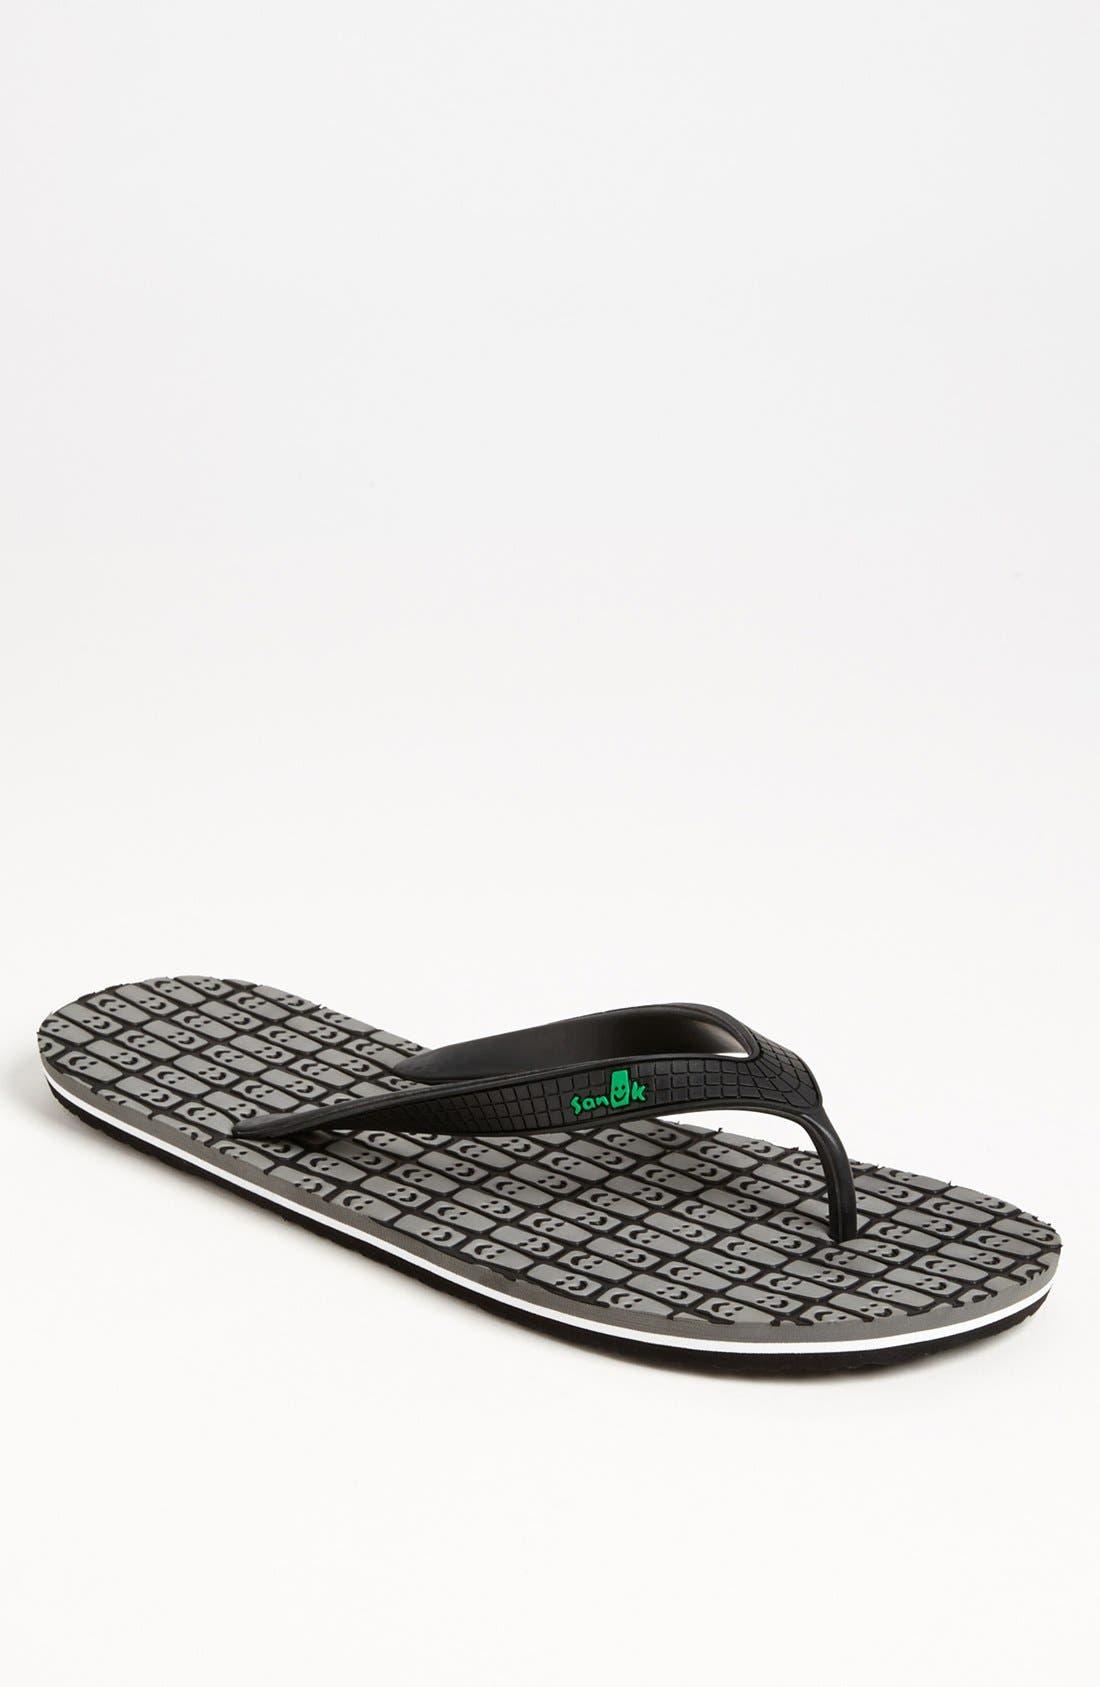 Alternate Image 1 Selected - Sanuk 'Tiki' Flip Flop (Men)